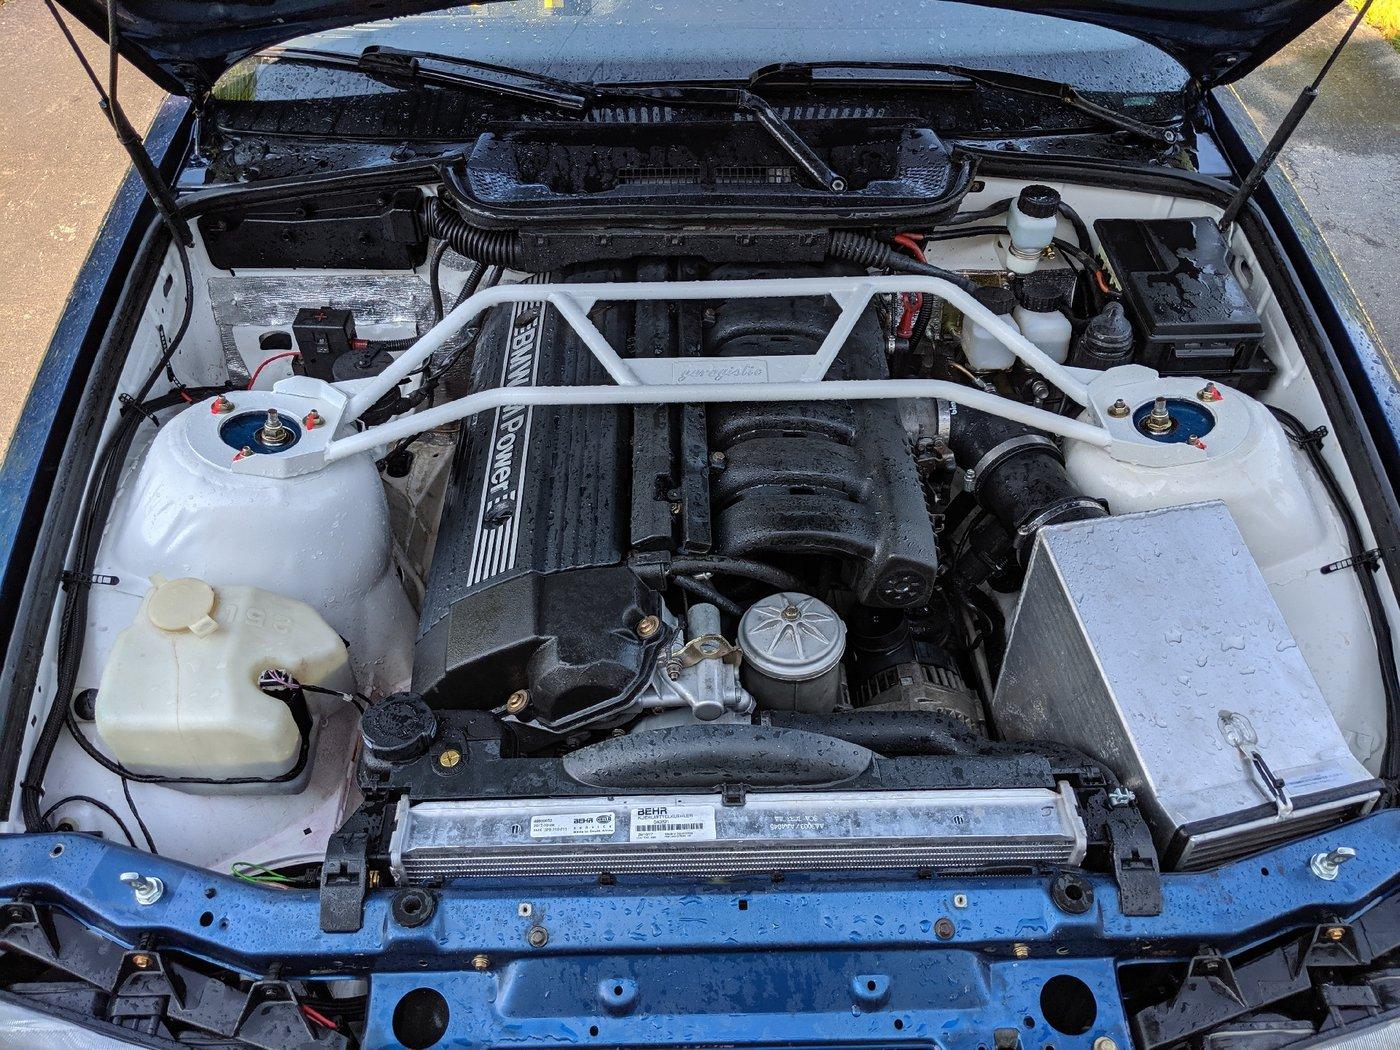 Bearded Ryno Rally Team BMW E36 M3 Rallycar underhood